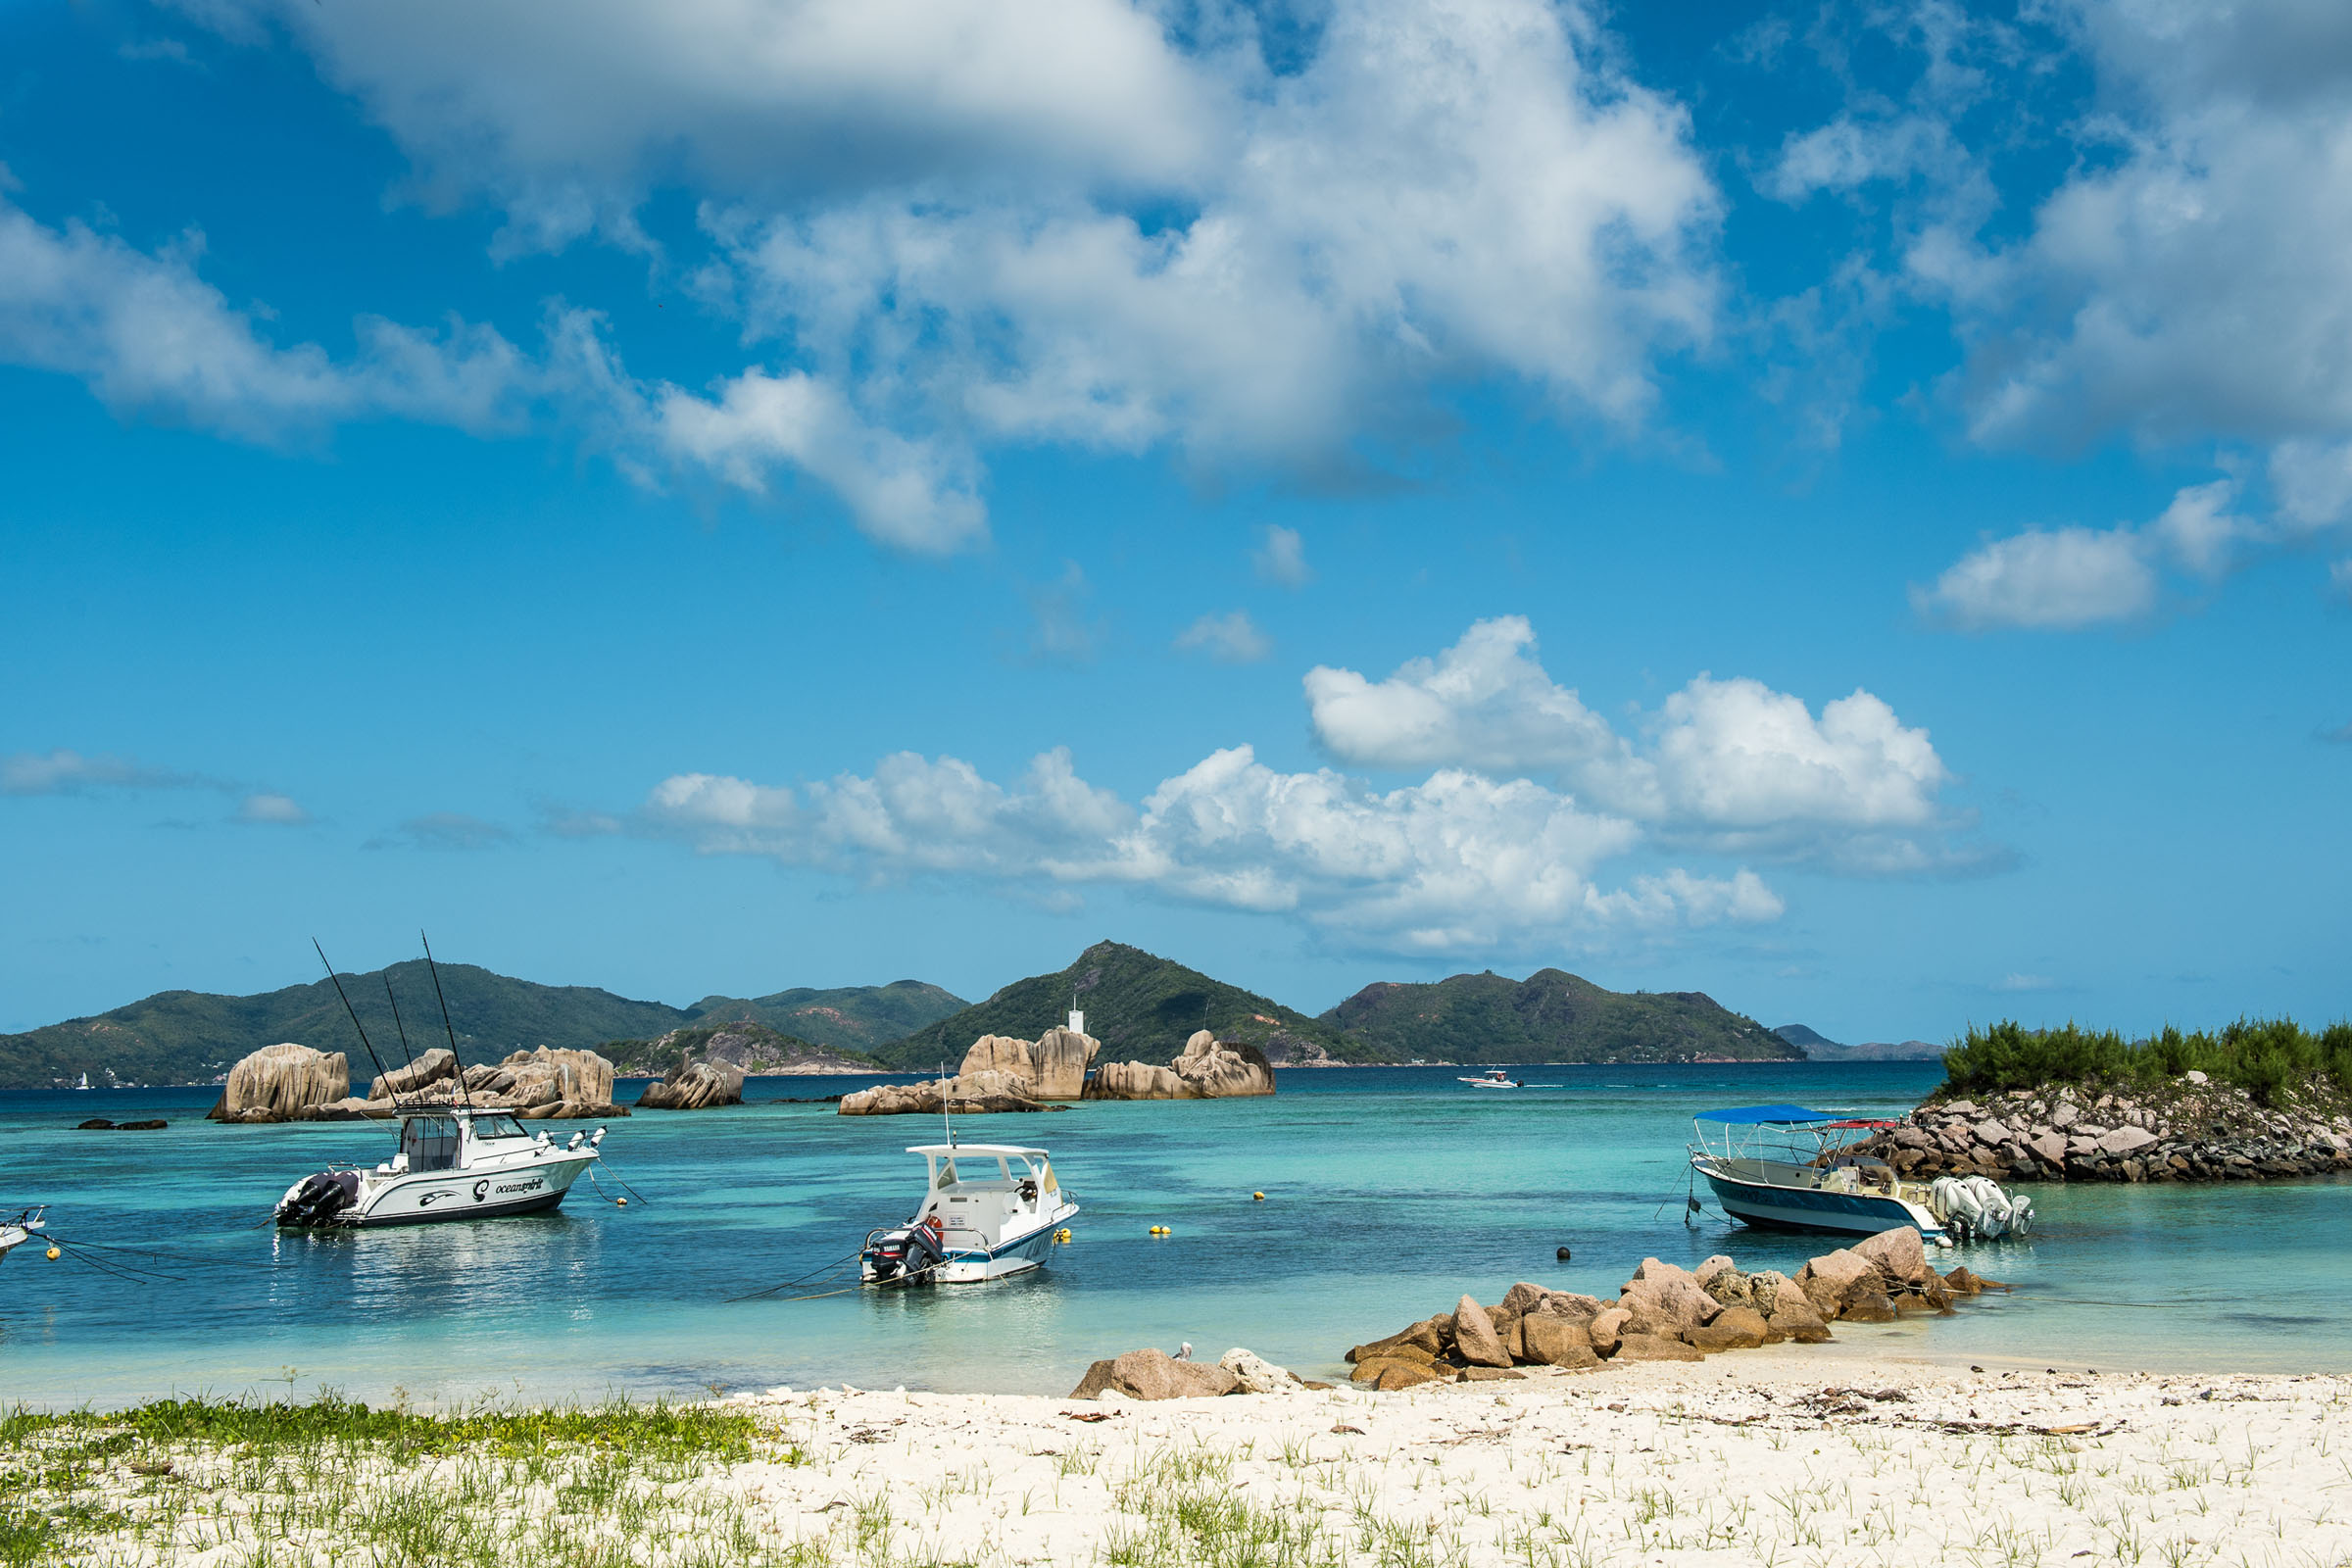 Inselglück Seychellen - Heike Mallad, Buch Tipp Seychellen